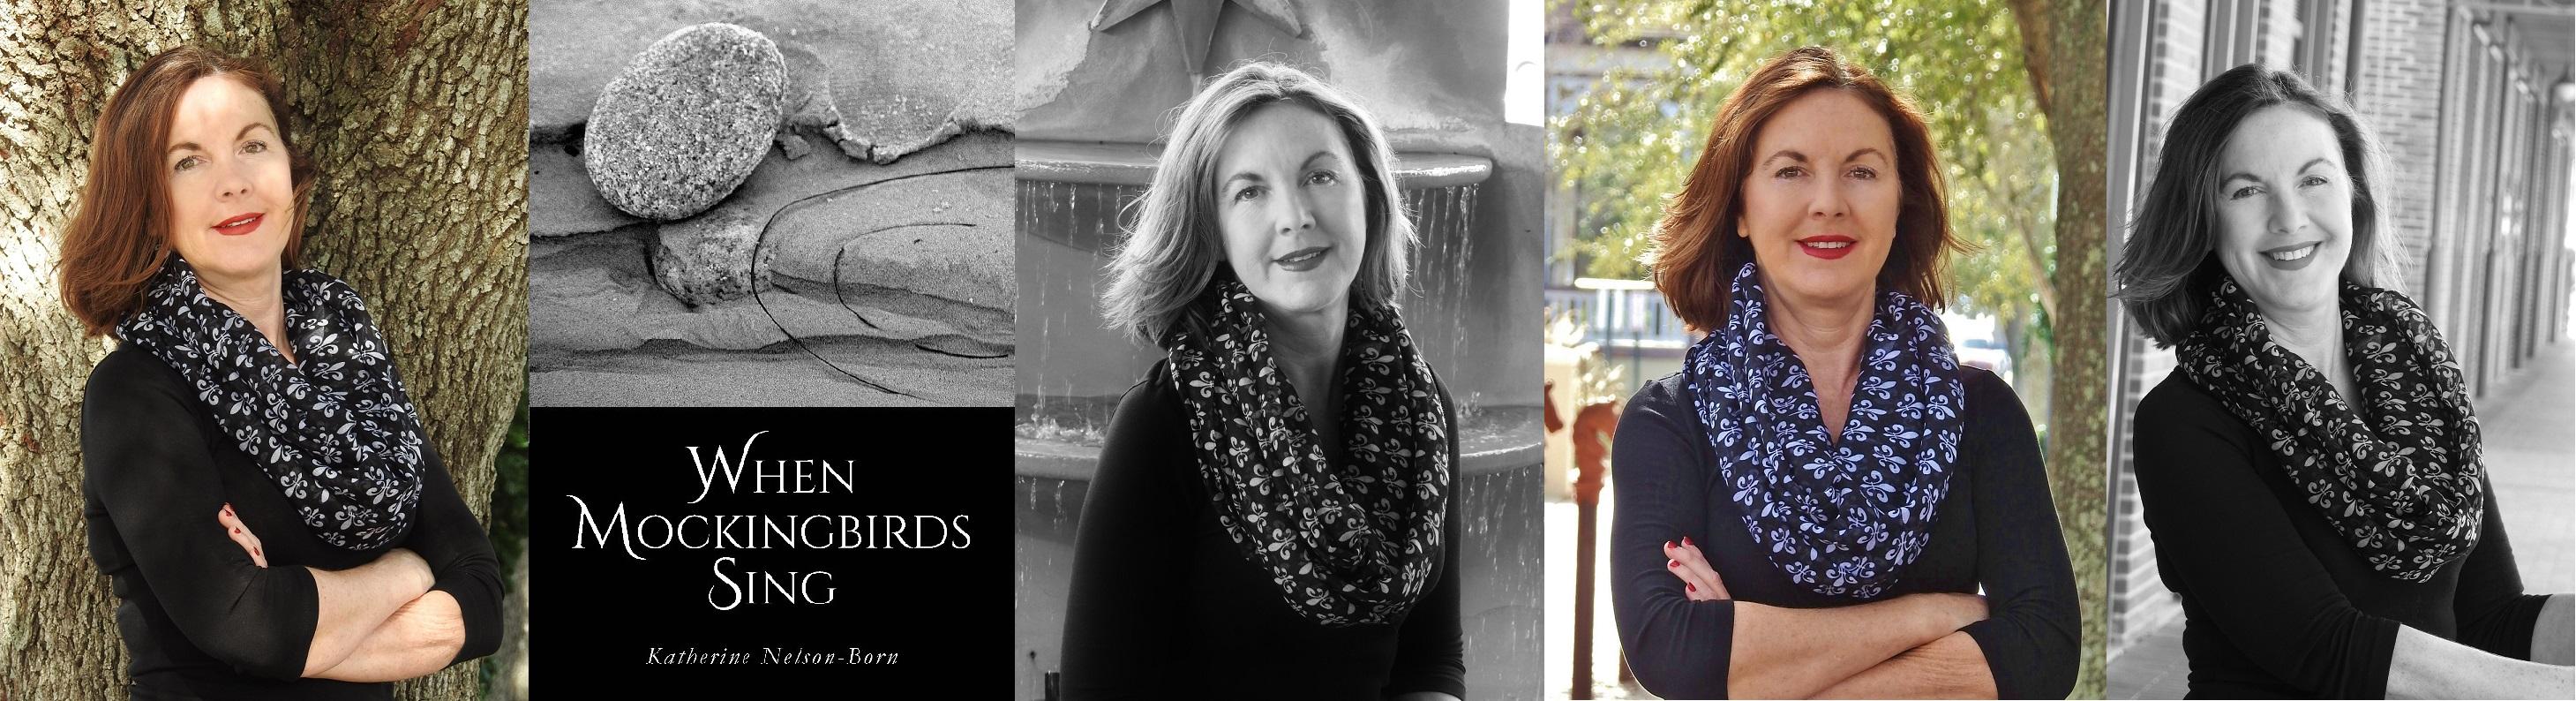 Photos of Katherine Nelson-Born, Northwest Florida Poet Laureate